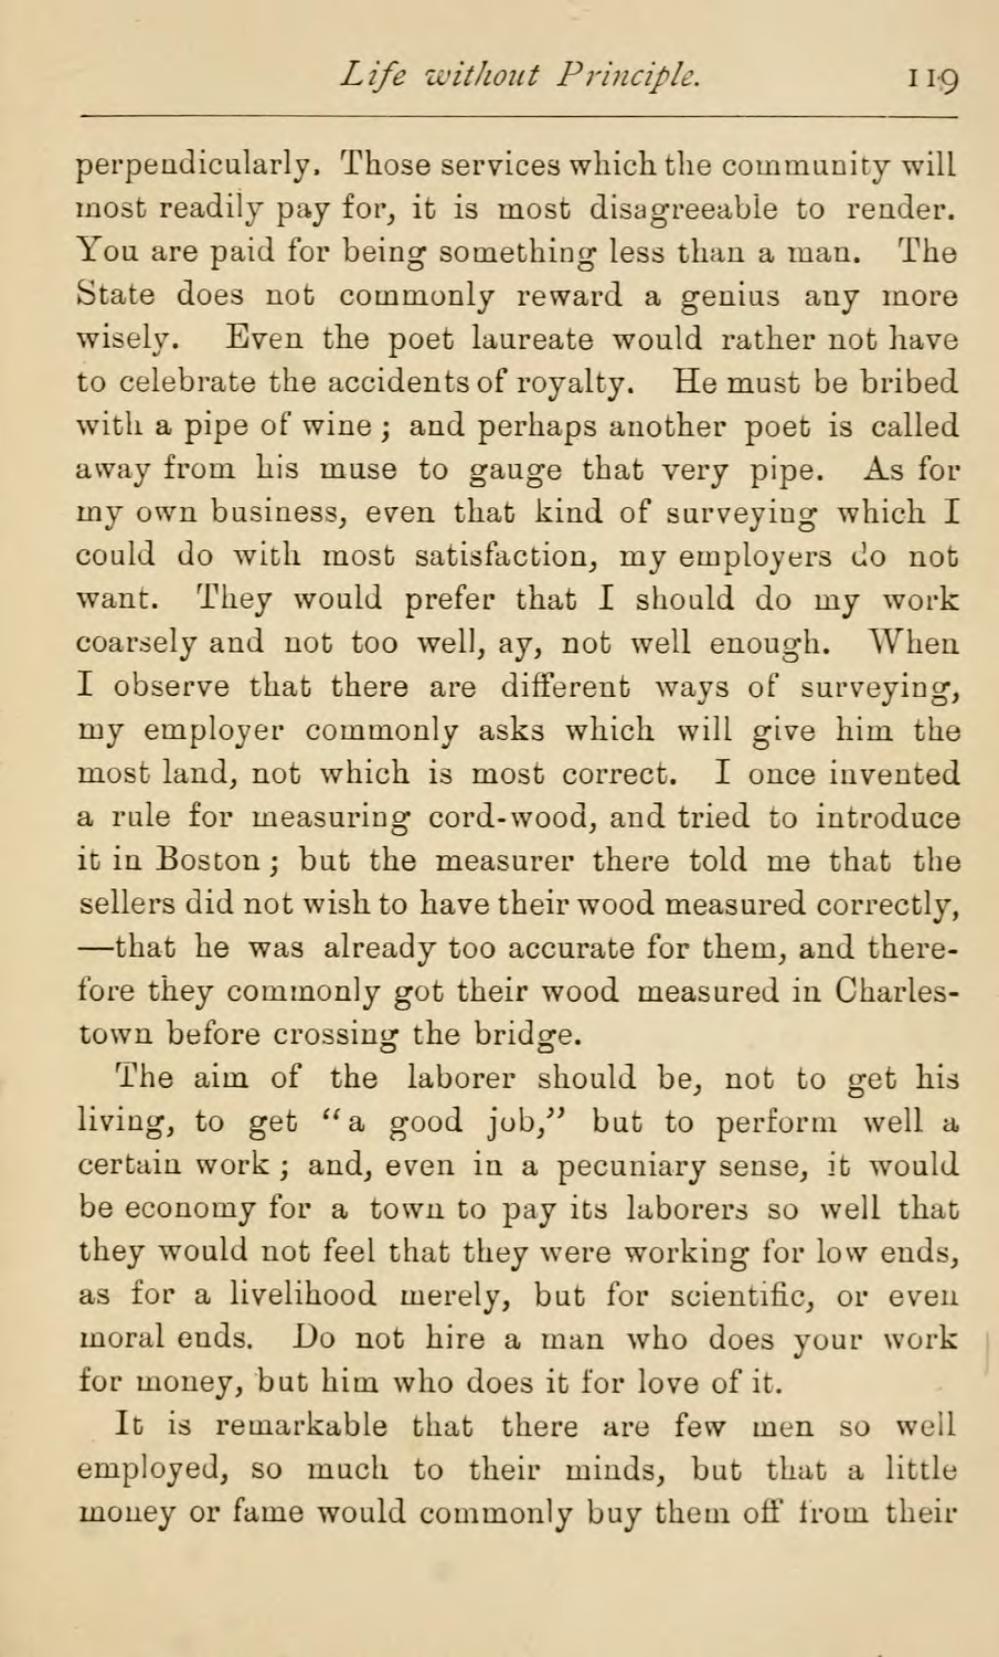 Henry david thoreau essay economy